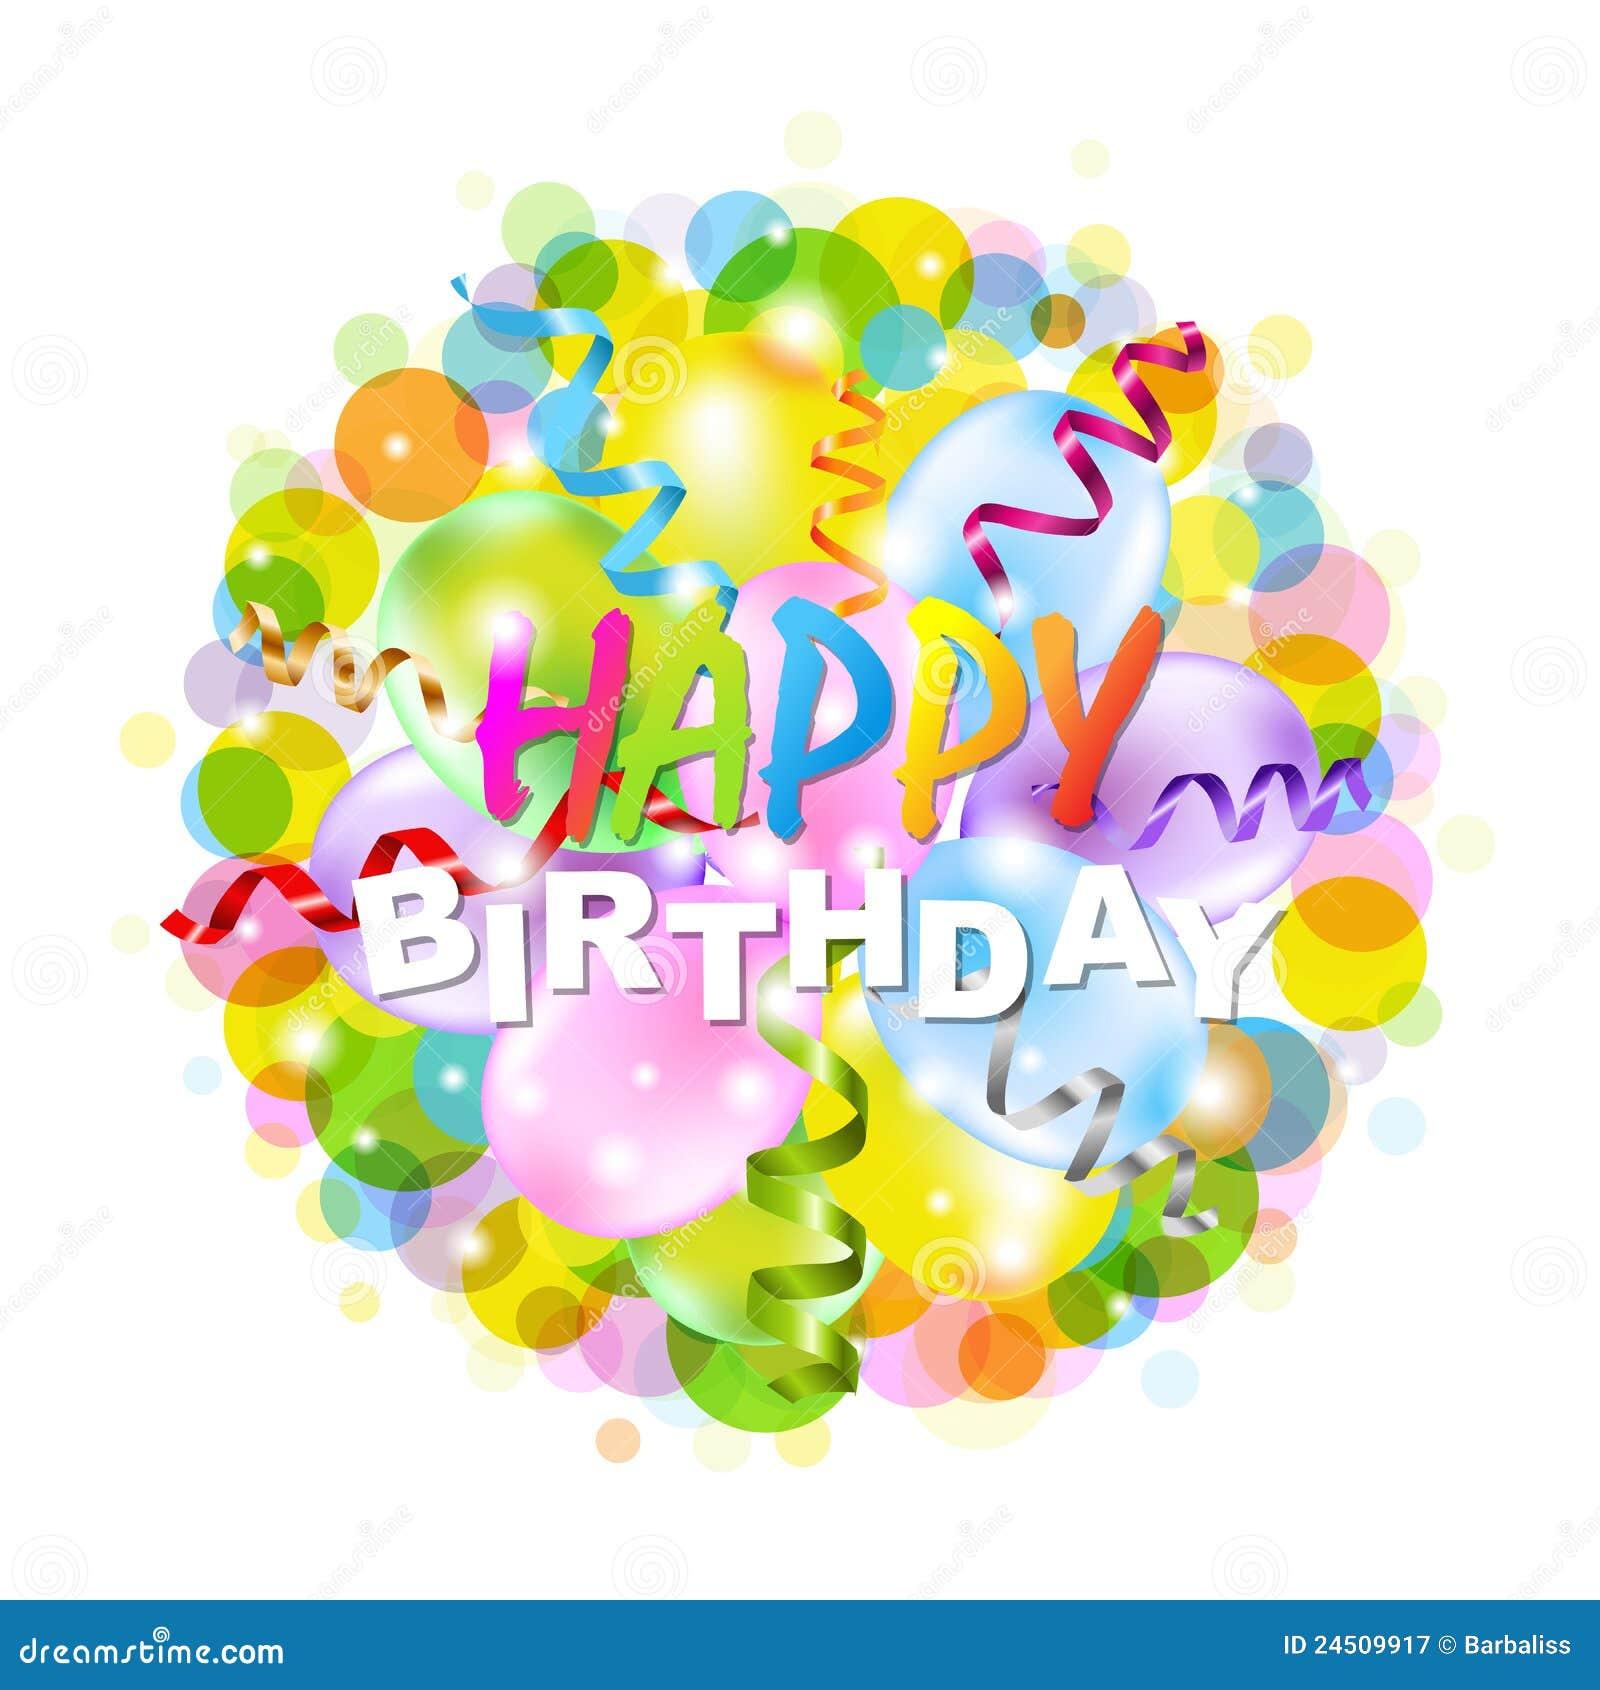 birthday posters free download koni polycode co